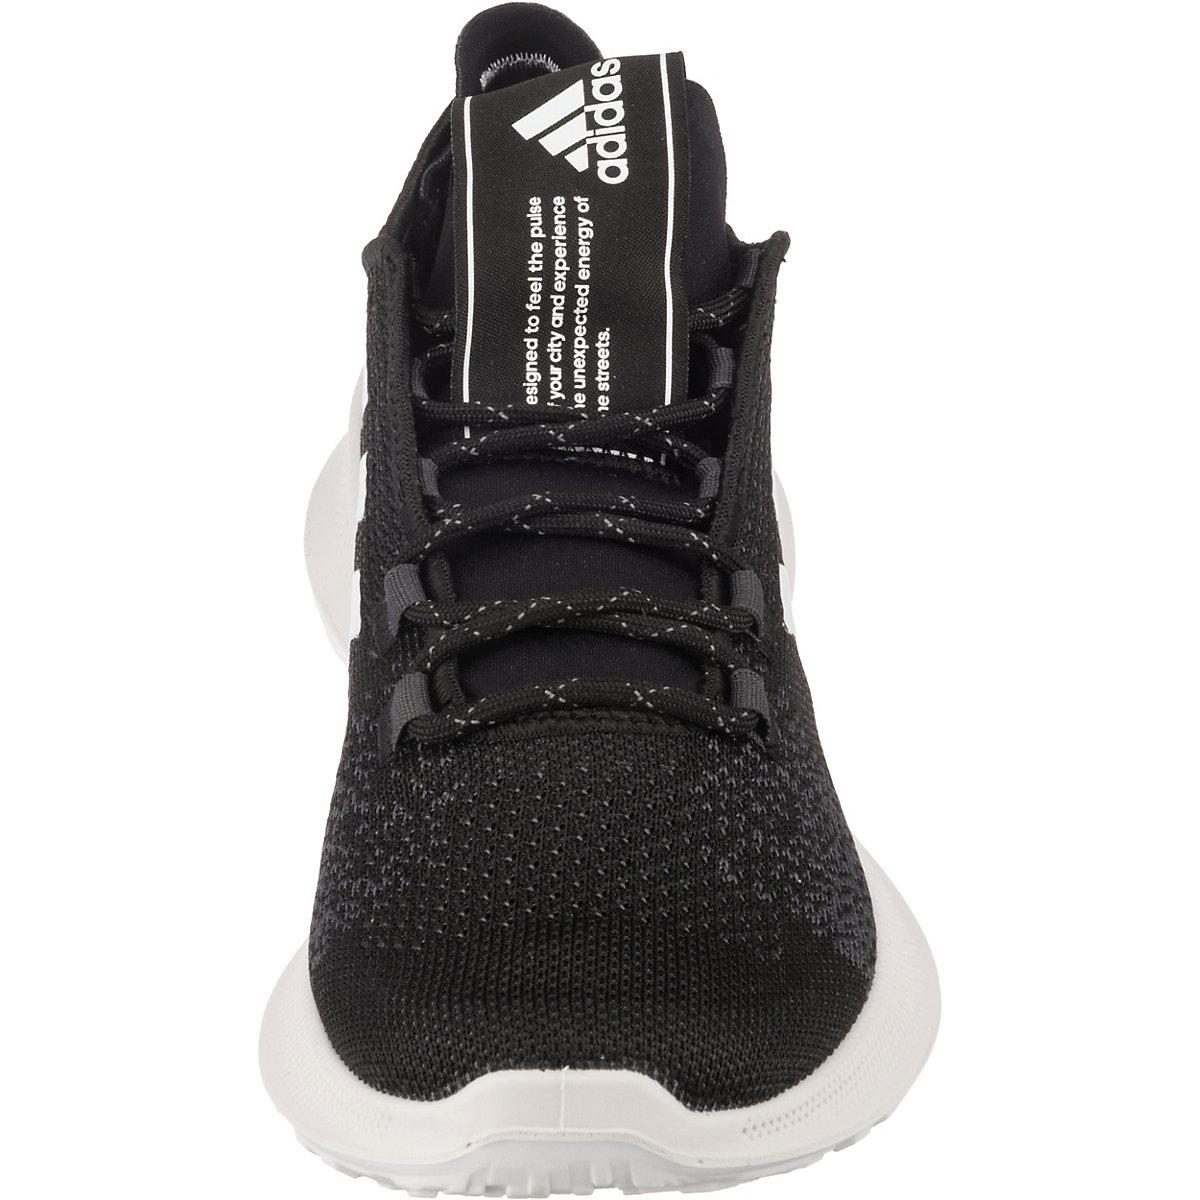 adidas Performance Sensebounce + Ace W Laufschuhe schwarz